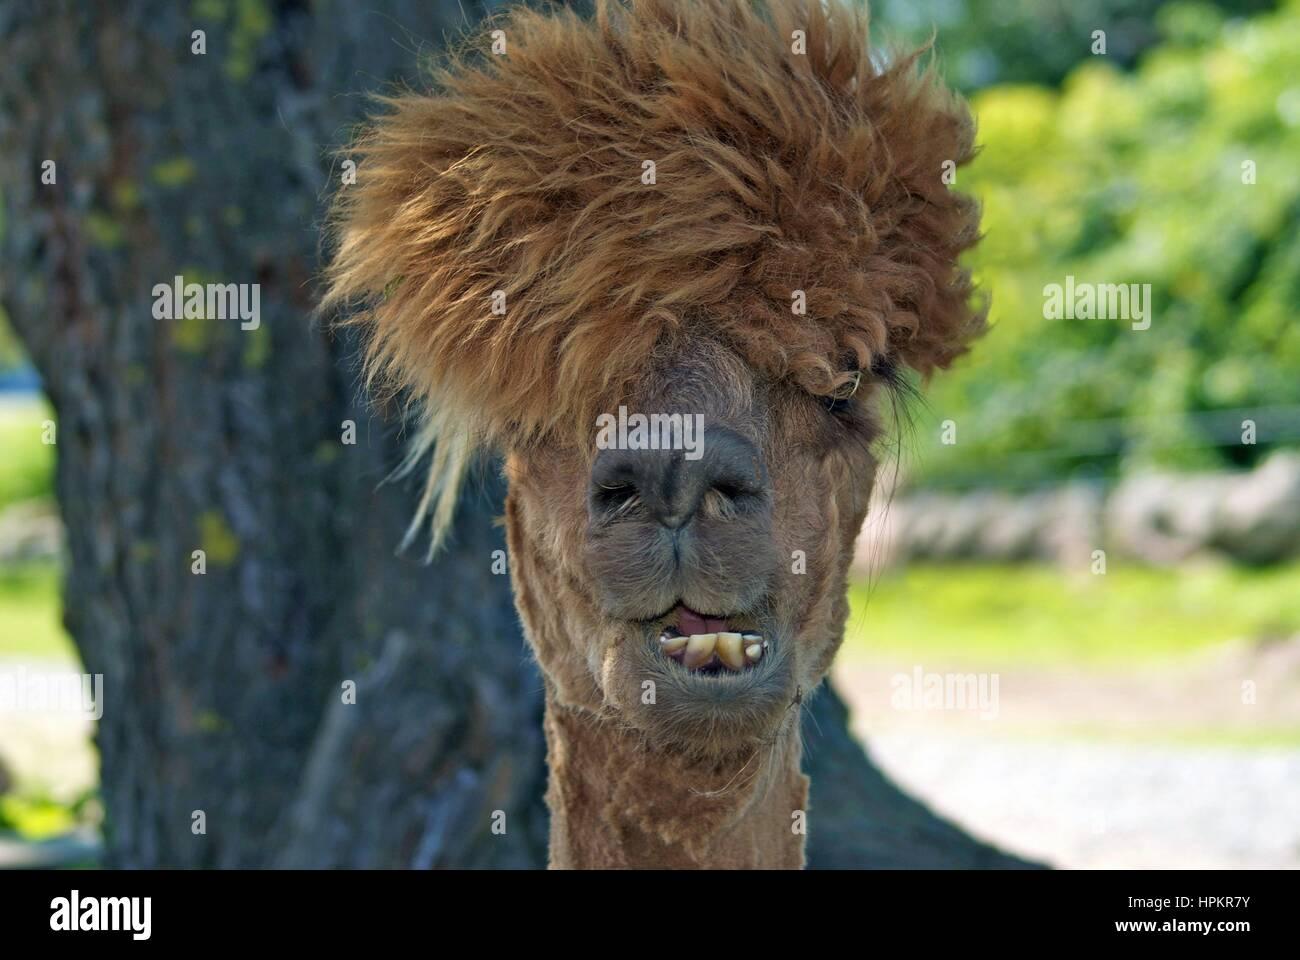 An Alpaca having bad hair day - Stock Image